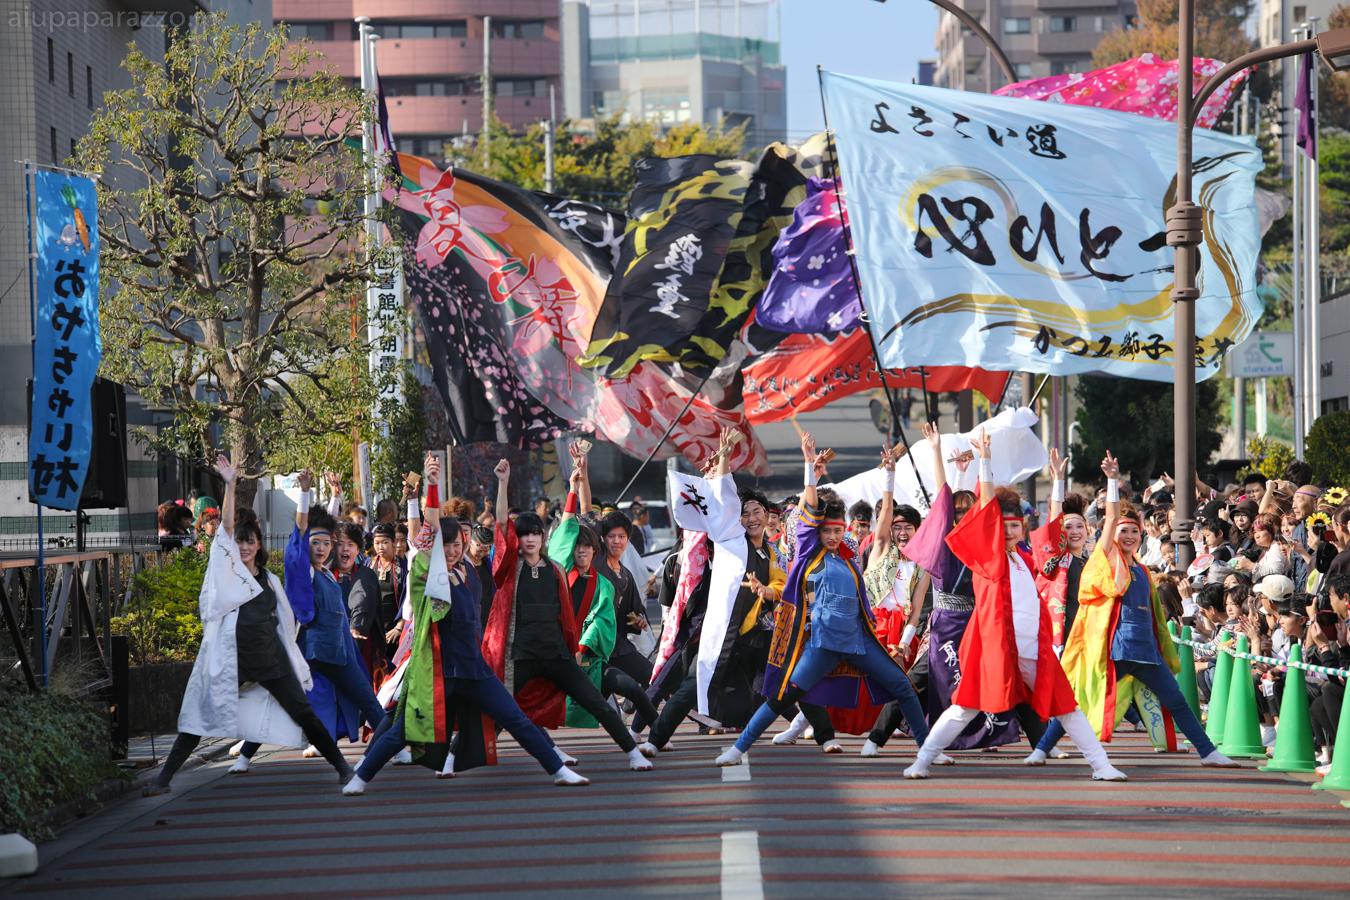 kanpachi2016oyachai-7.jpg